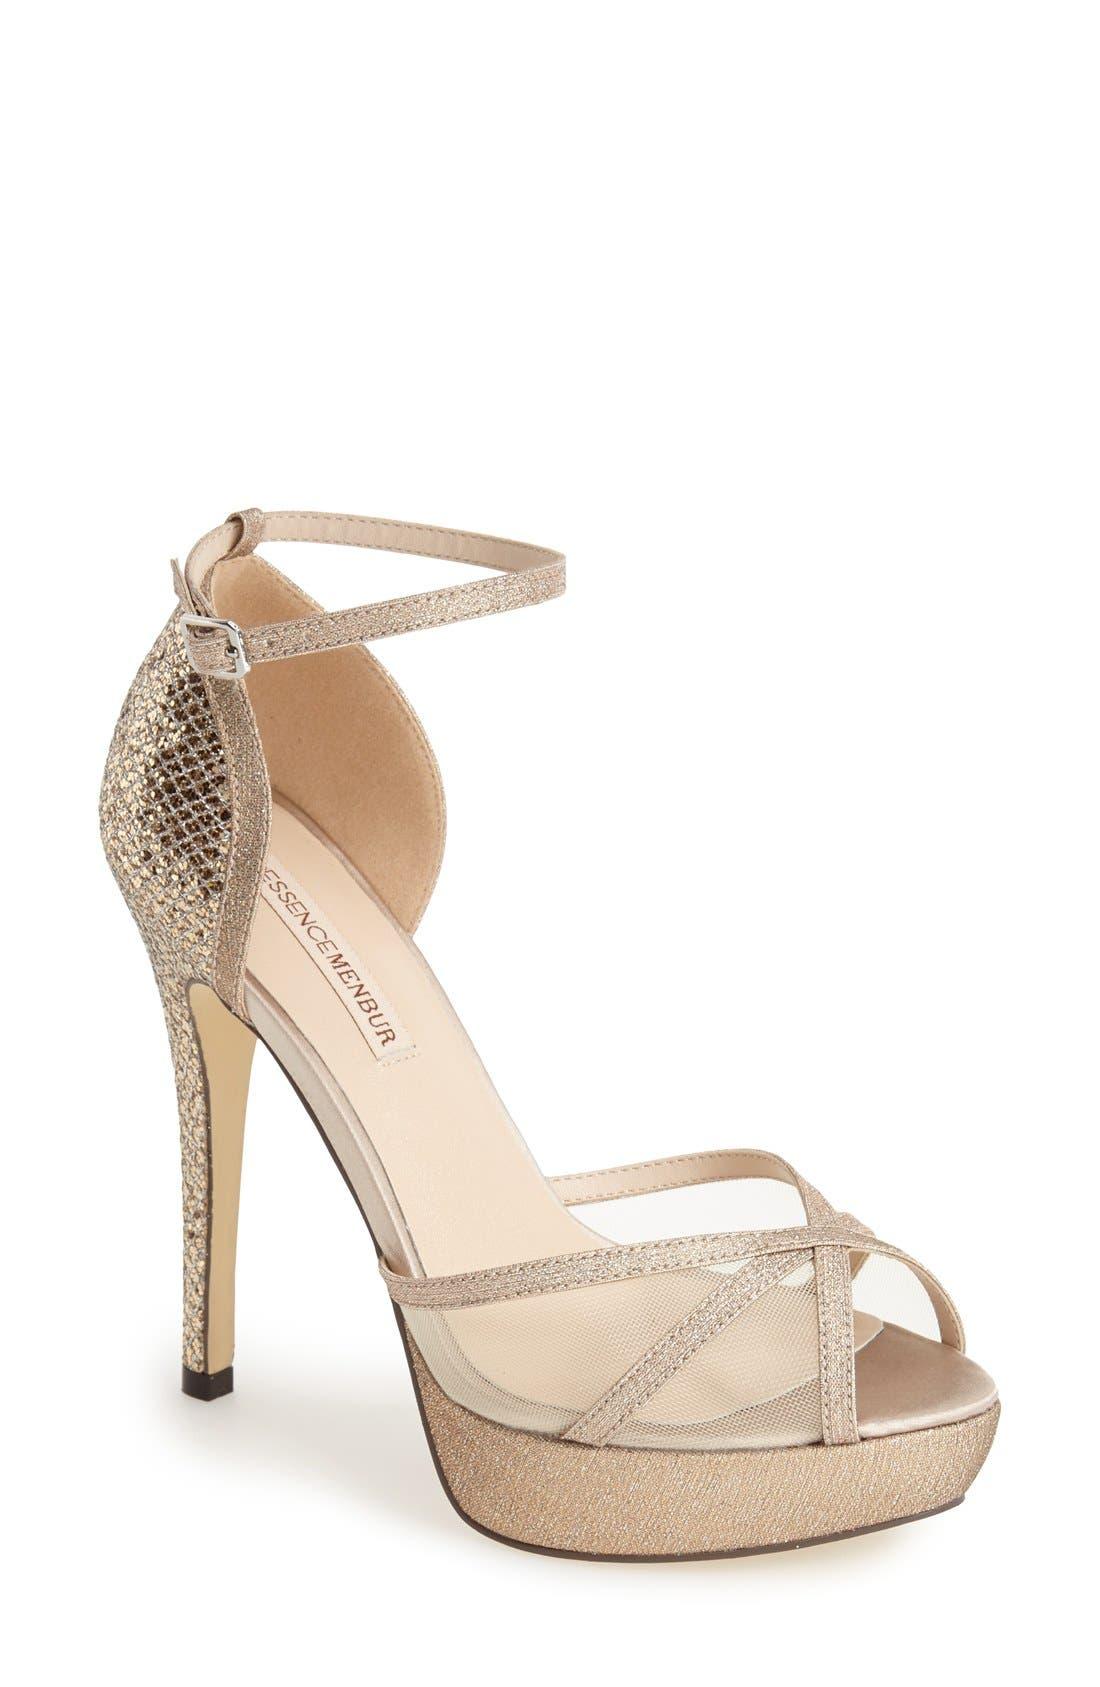 Alternate Image 1 Selected - Menbur 'Anora' Ankle Strap Platform Sandal (Women)